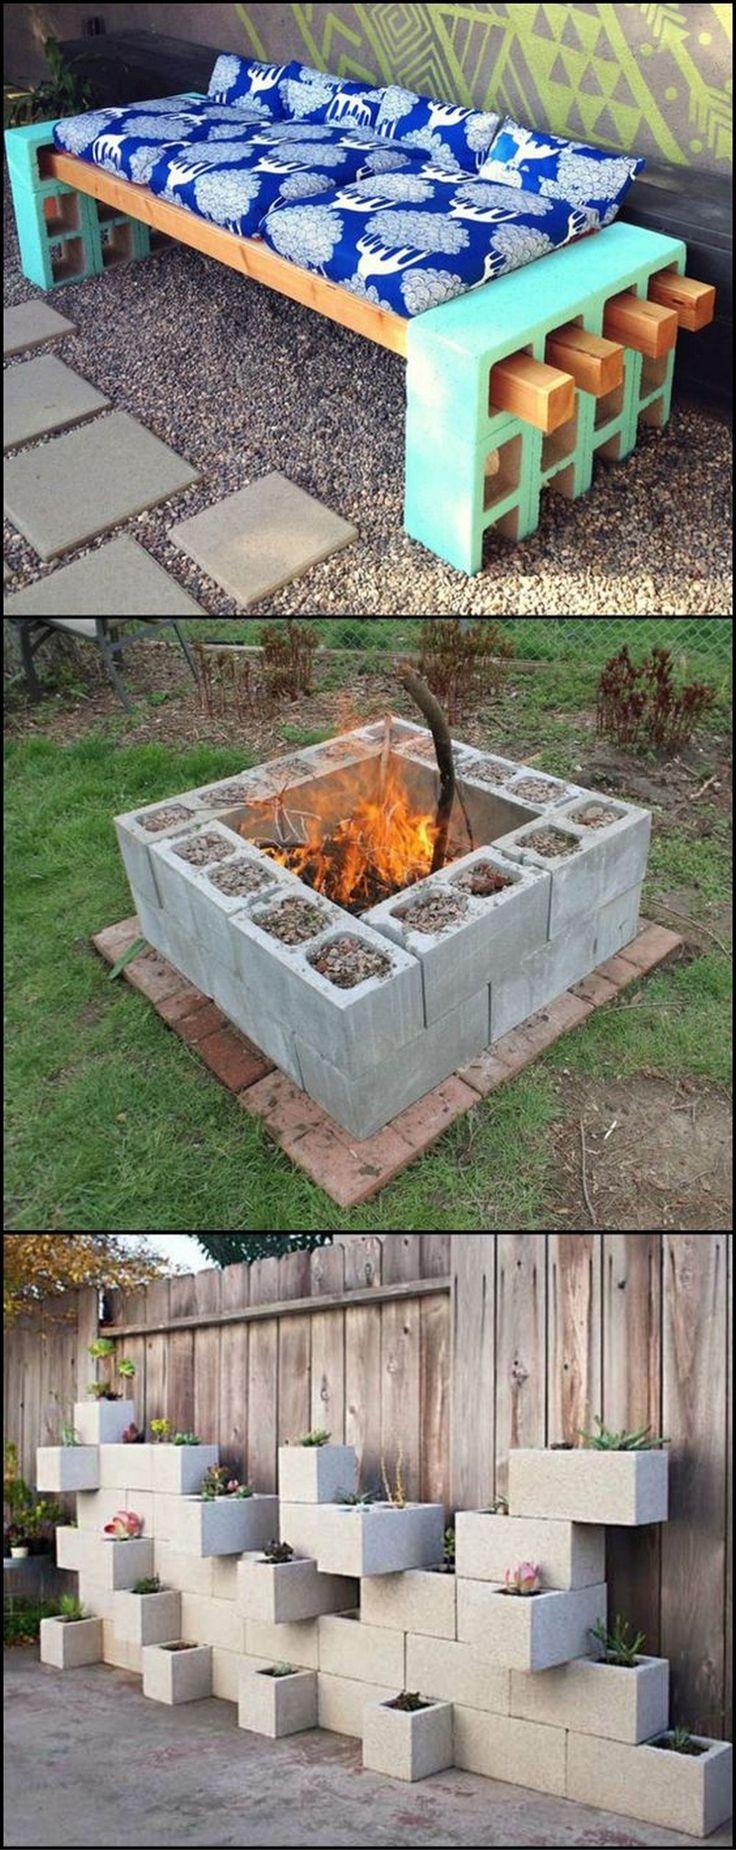 cool 120 DIY Cinder Block Ideas to Decorating Your Outdoor Space https://wartaku.net/2017/04/14/120-diy-cinder-block-ideas-to-decorating-your-outdoor-space/